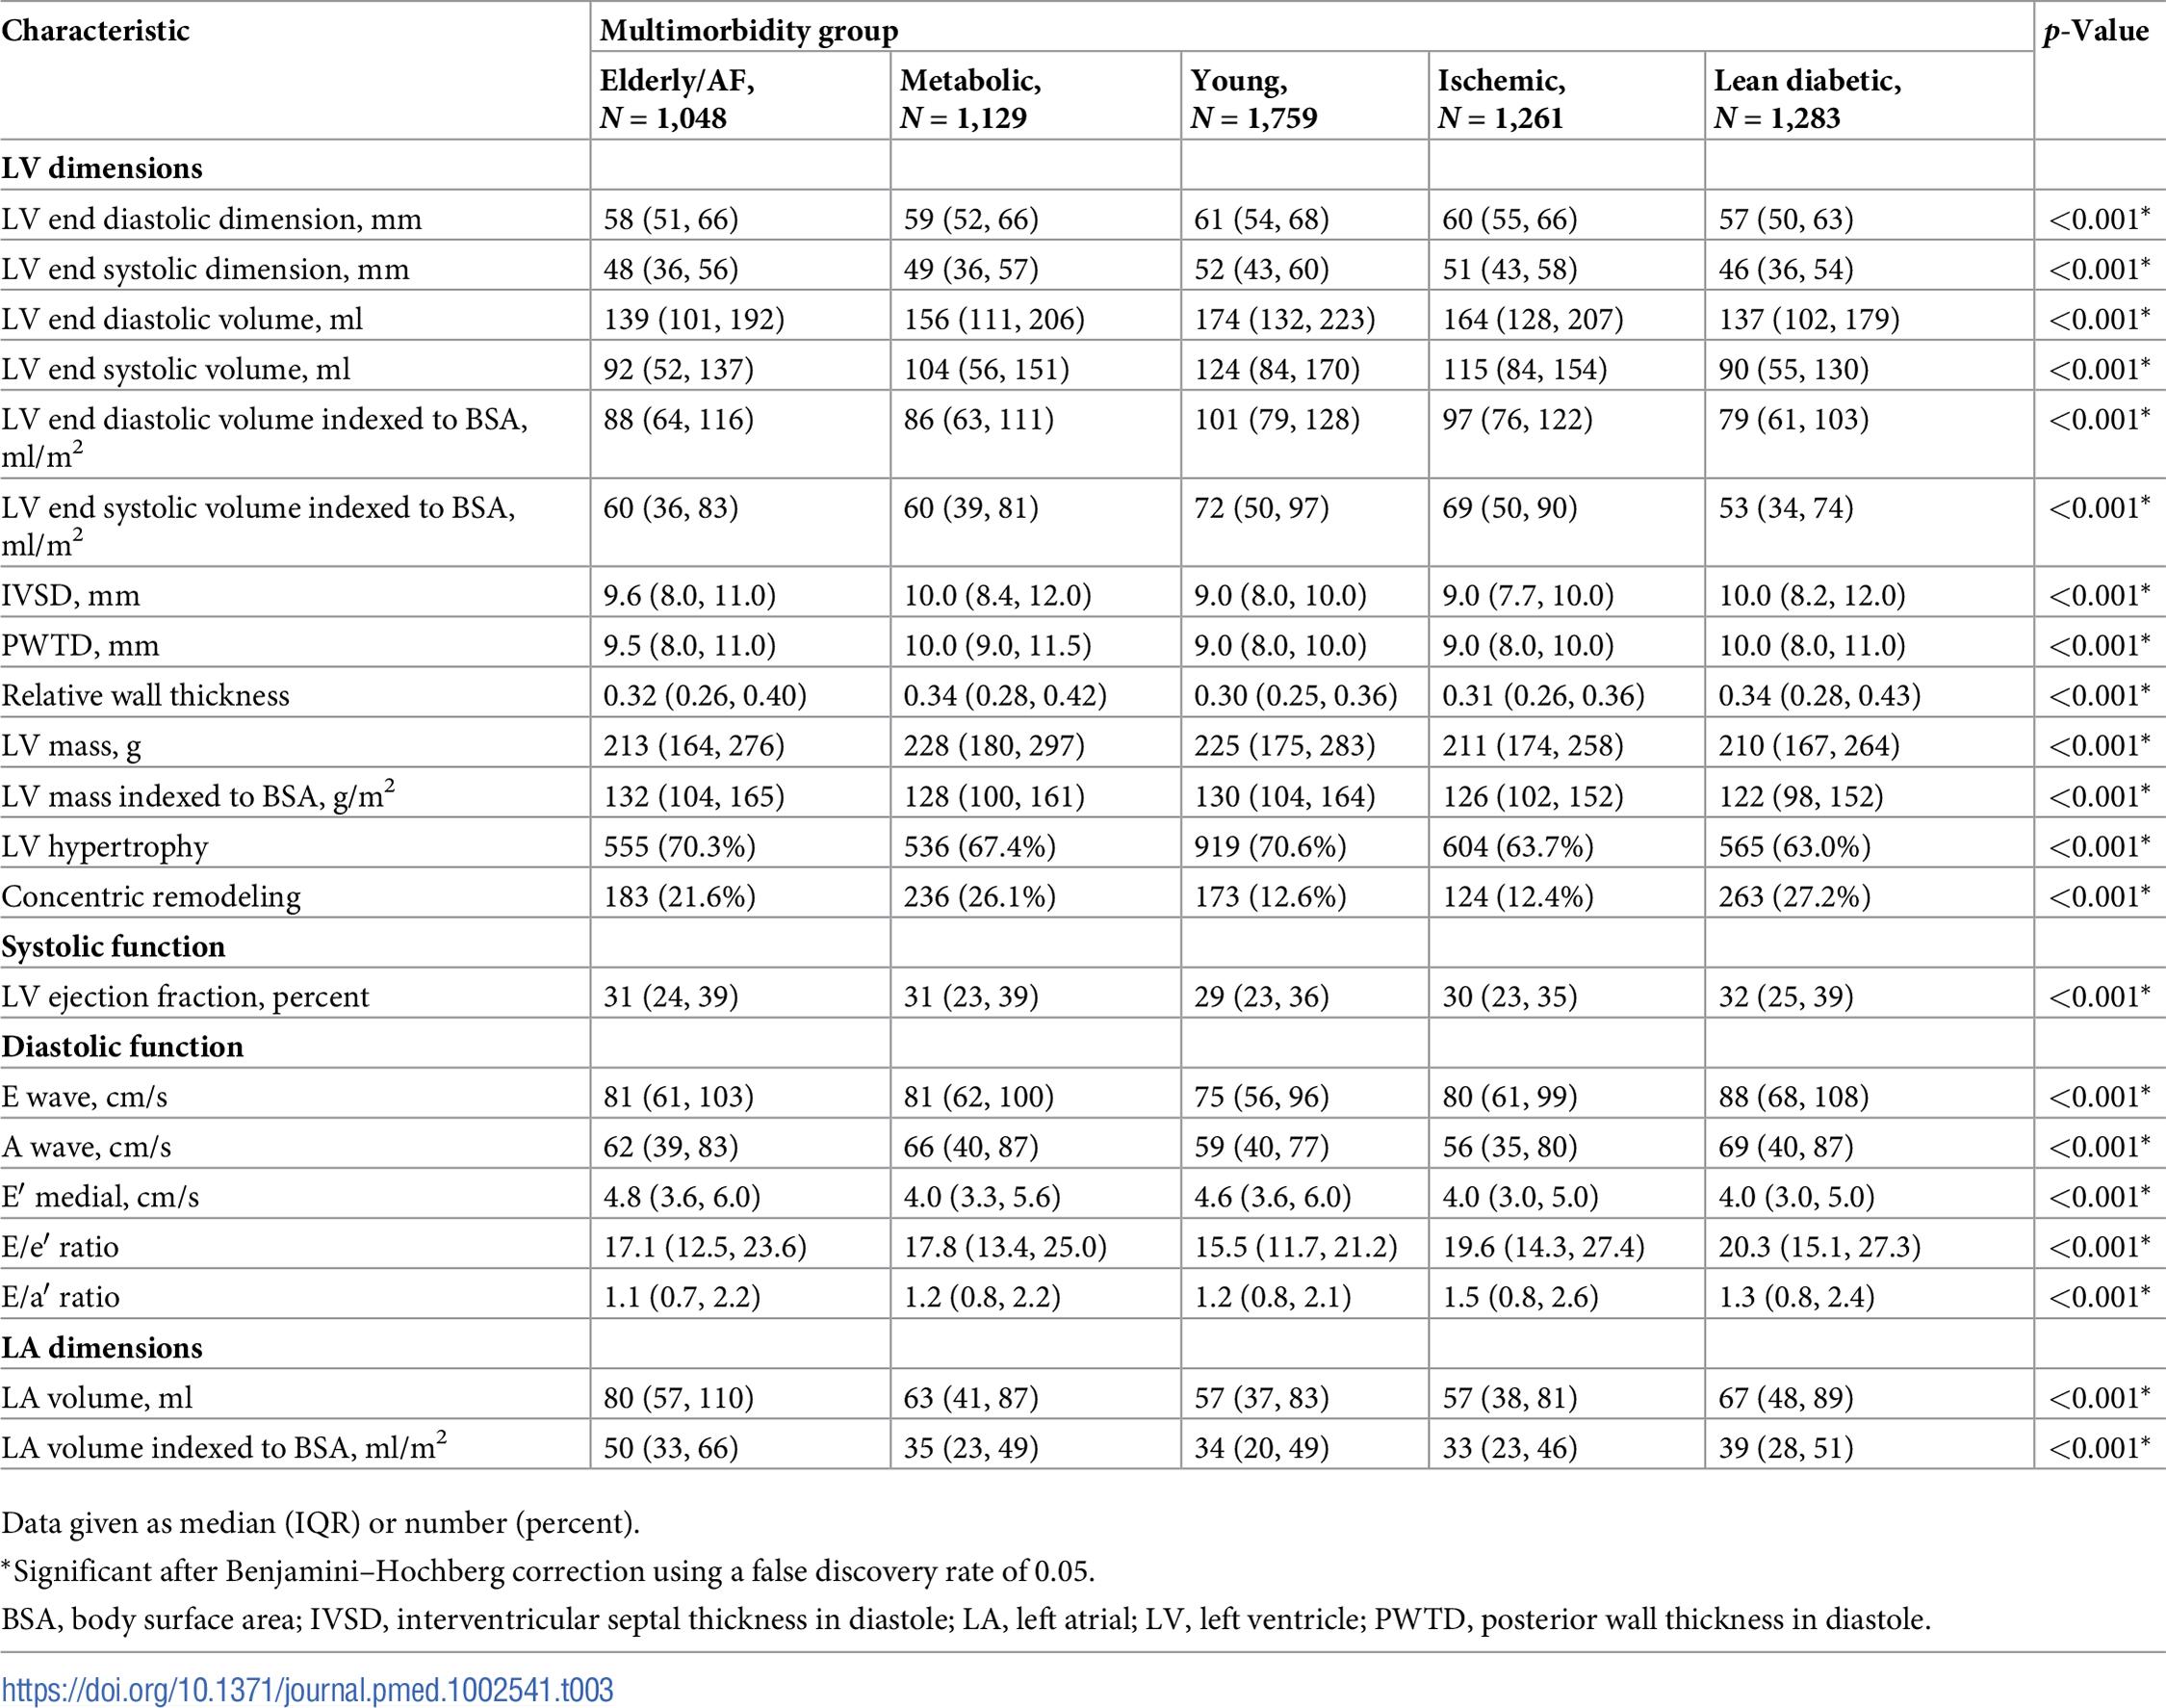 Echocardiographic characteristics.